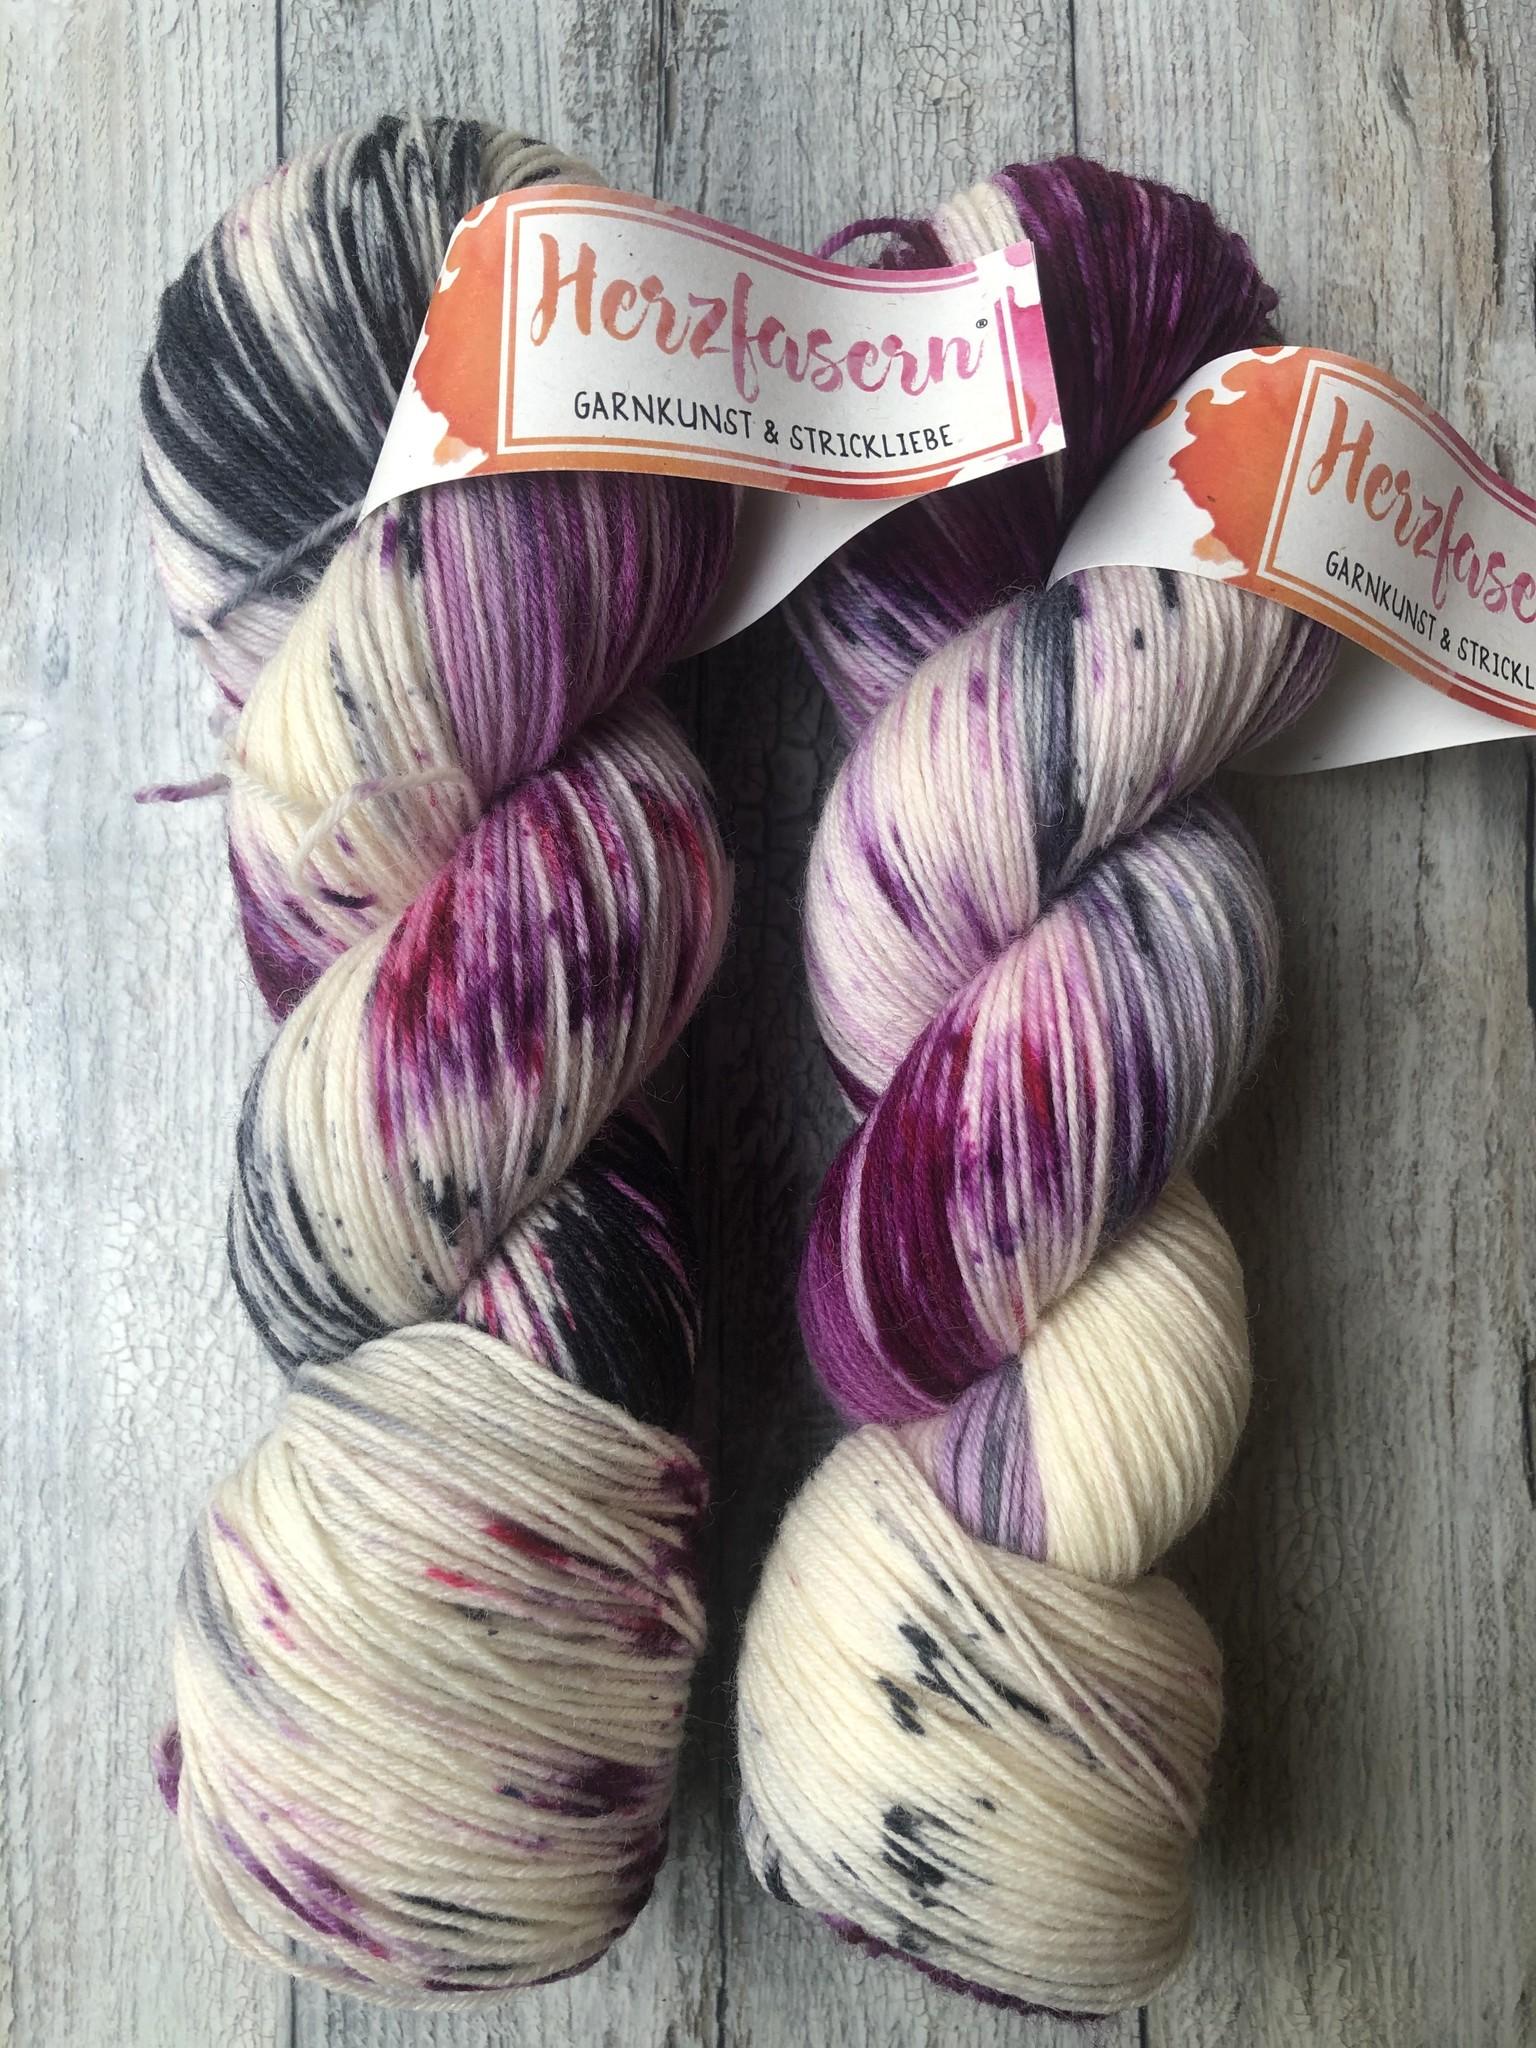 Herzfasern Sockenwolle -Beerenmix